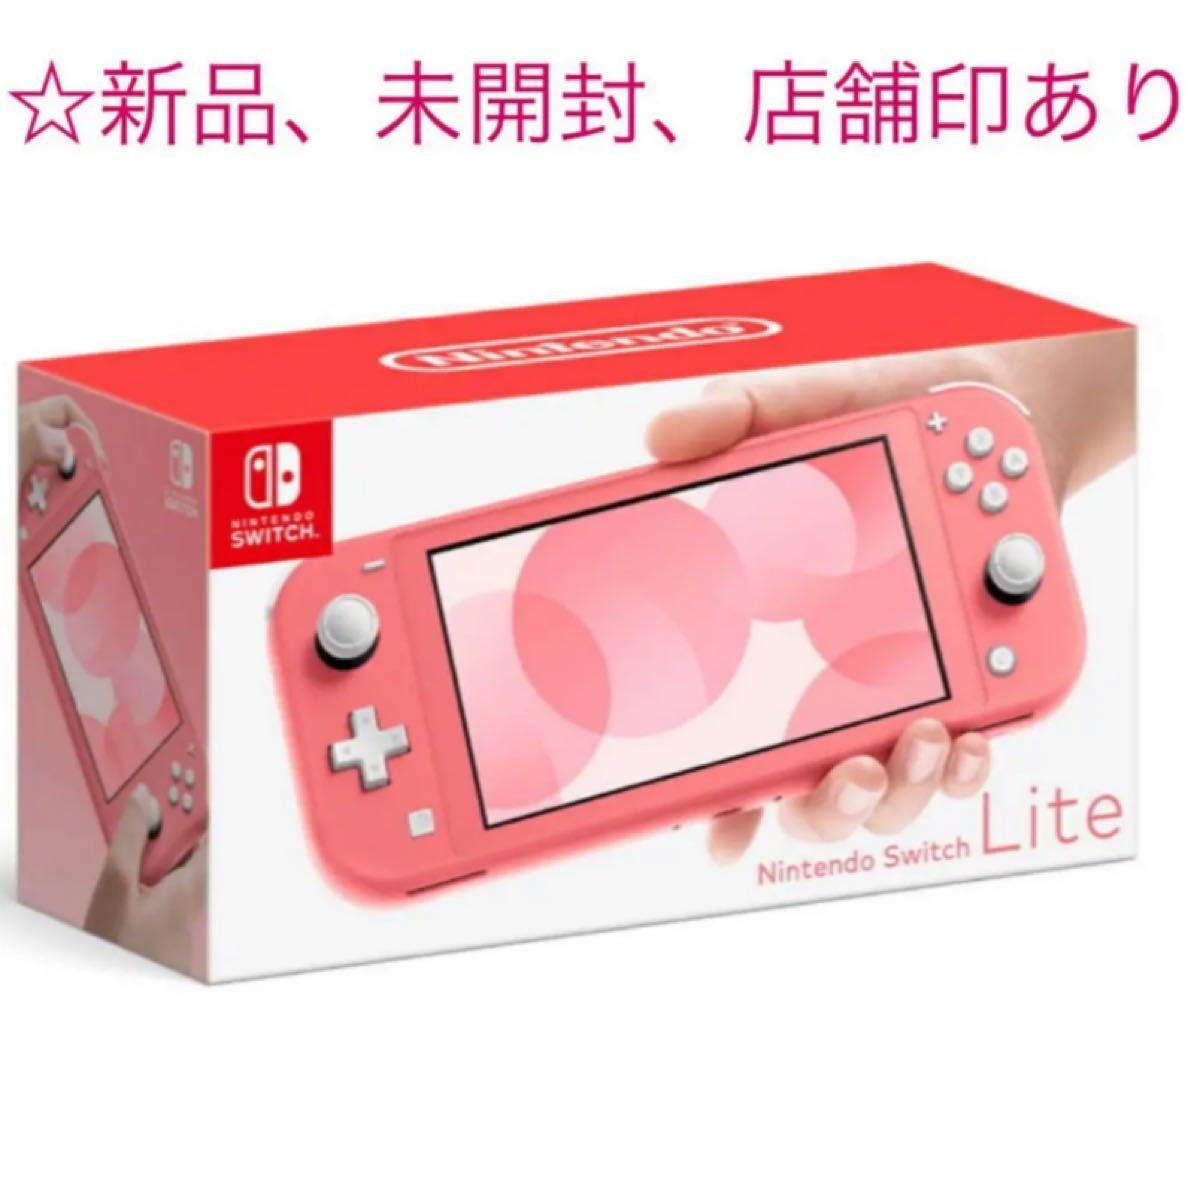 Nintendo Switch スイッチ ライト コーラル ピンク 本体